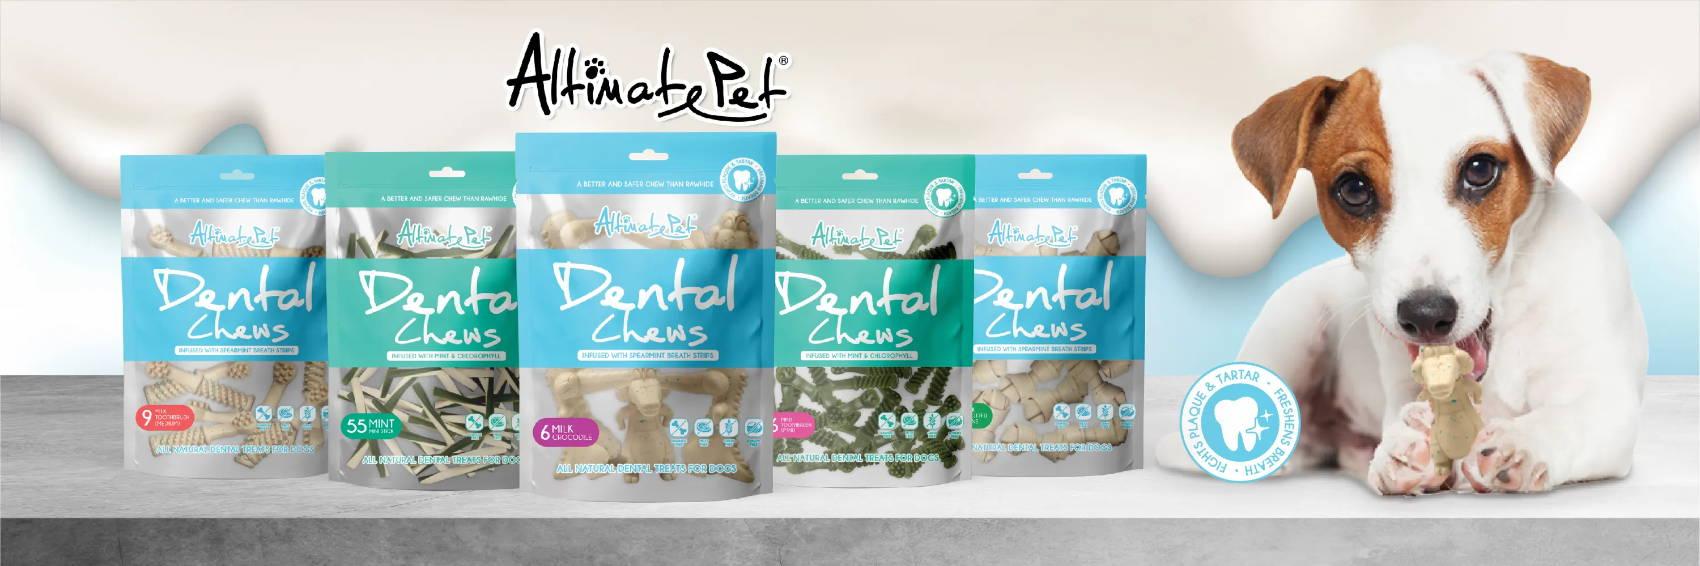 Altimate Pet dental chew banner